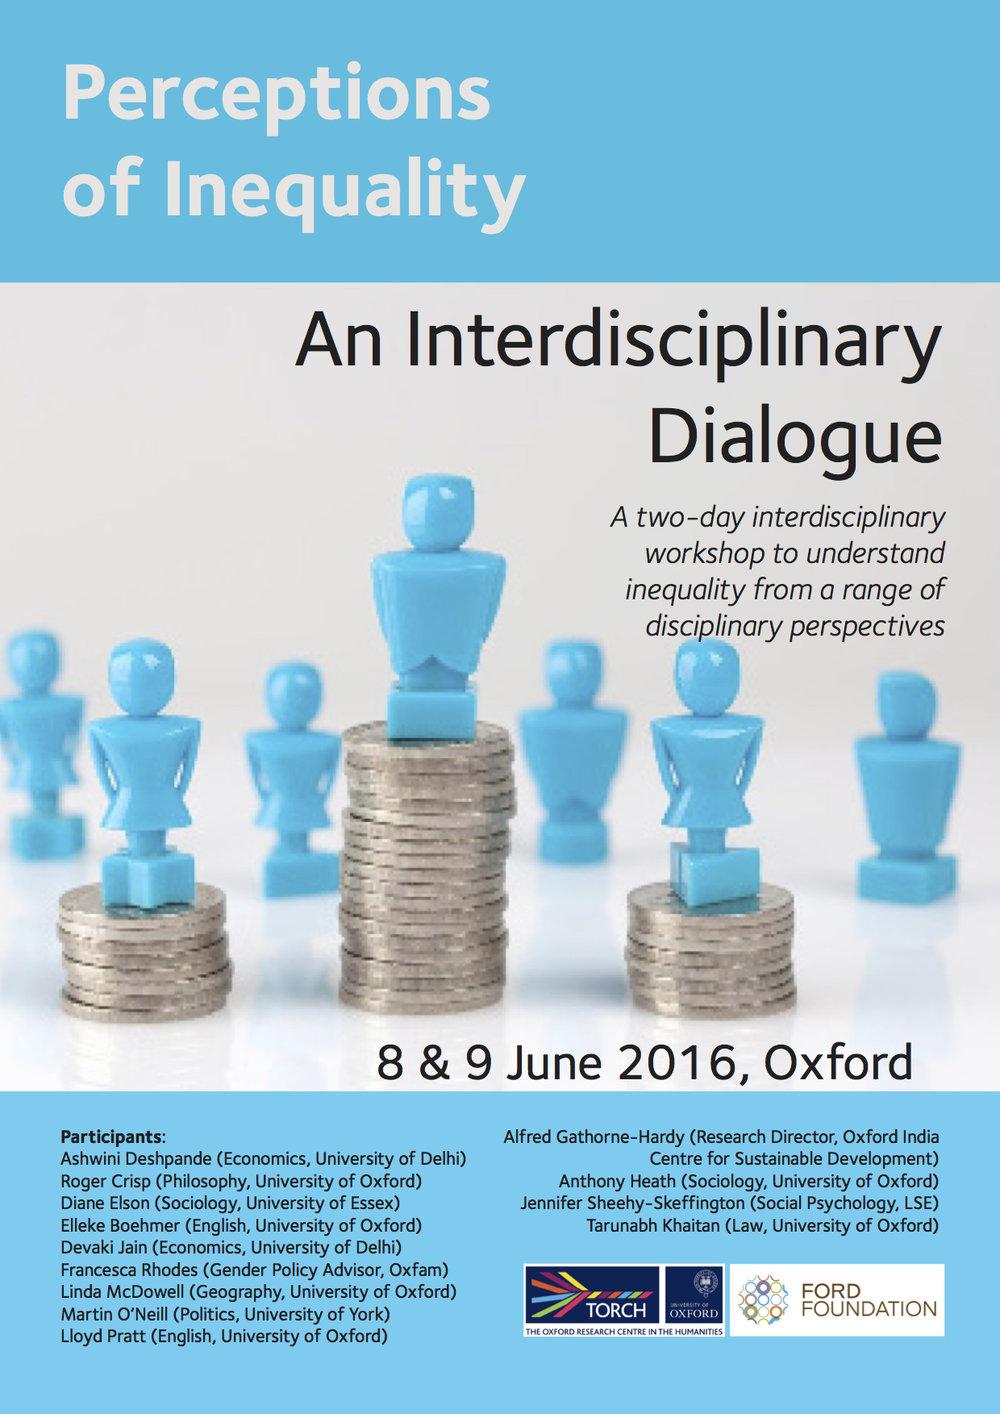 Inequality Seminar Poster.jpg